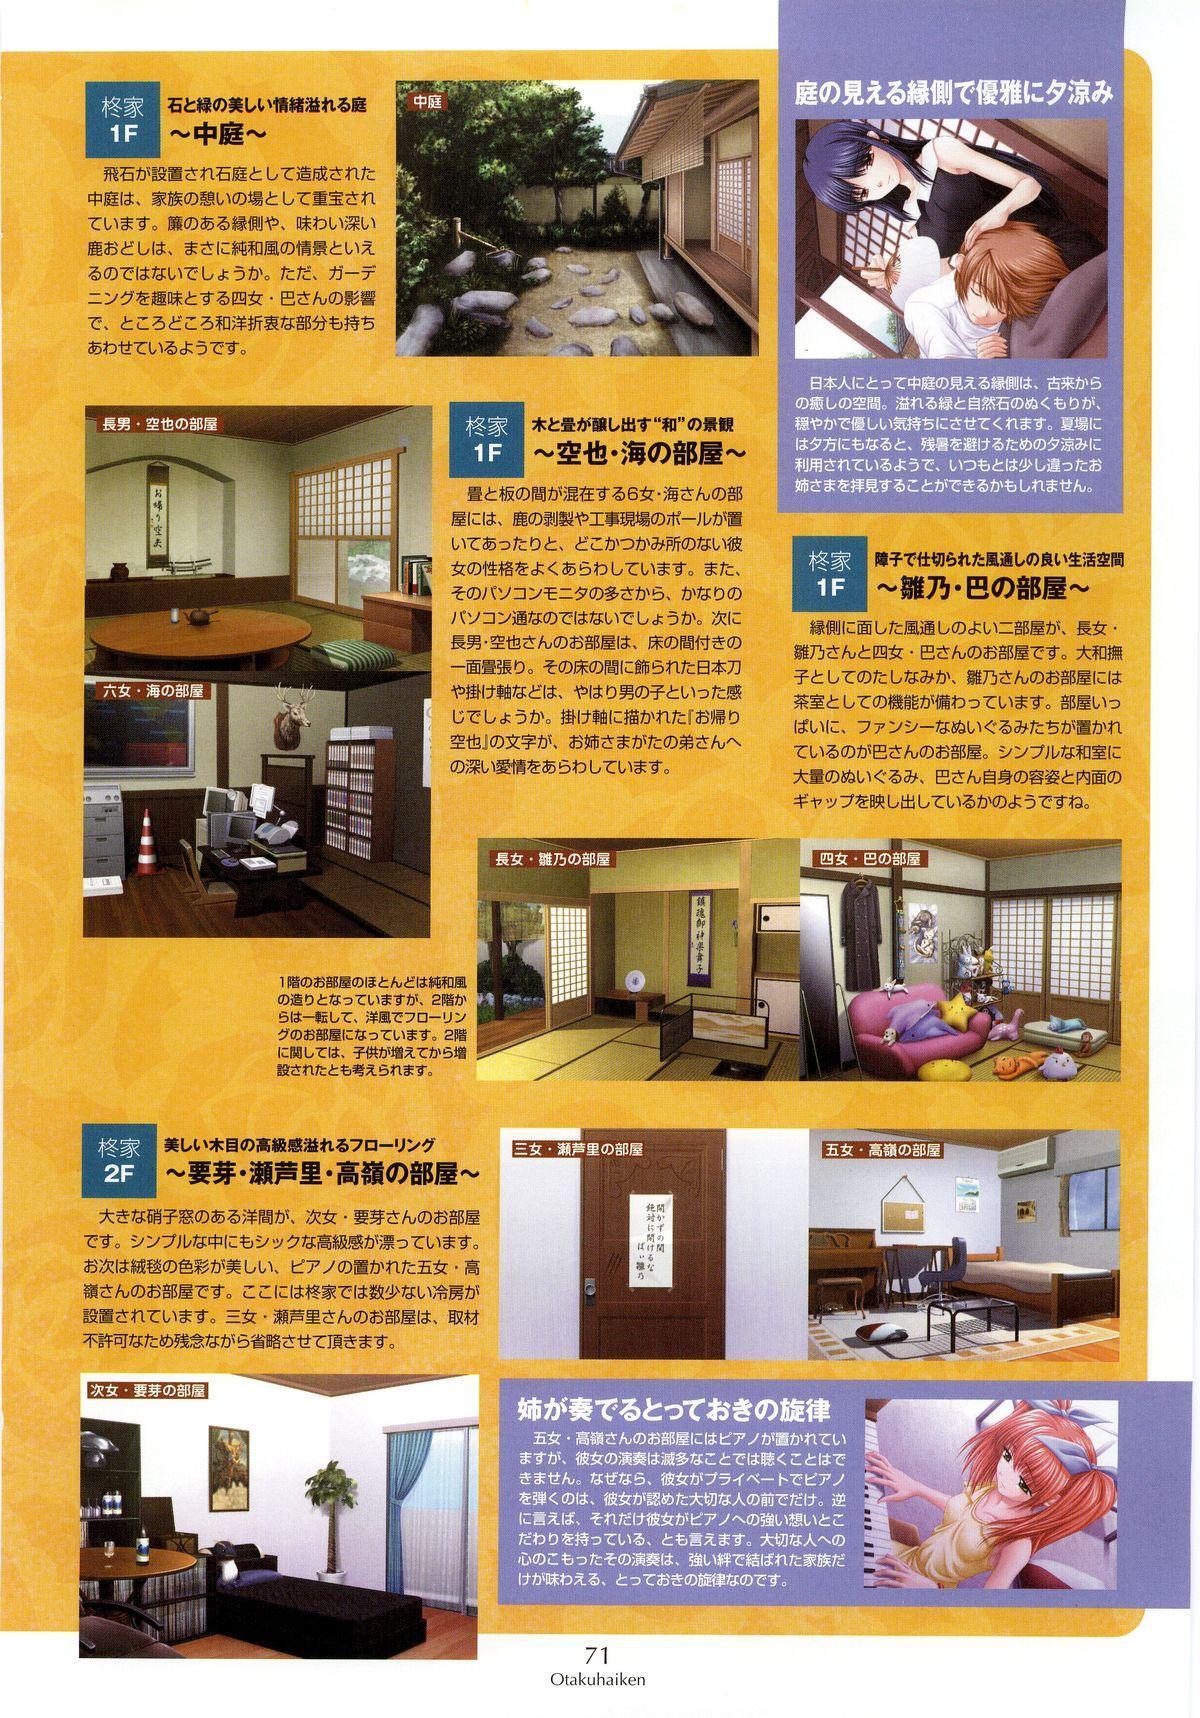 Nee, Chan to Shiyou yo! Koushiki Fanbook - Ai to Batou no Hibi 62